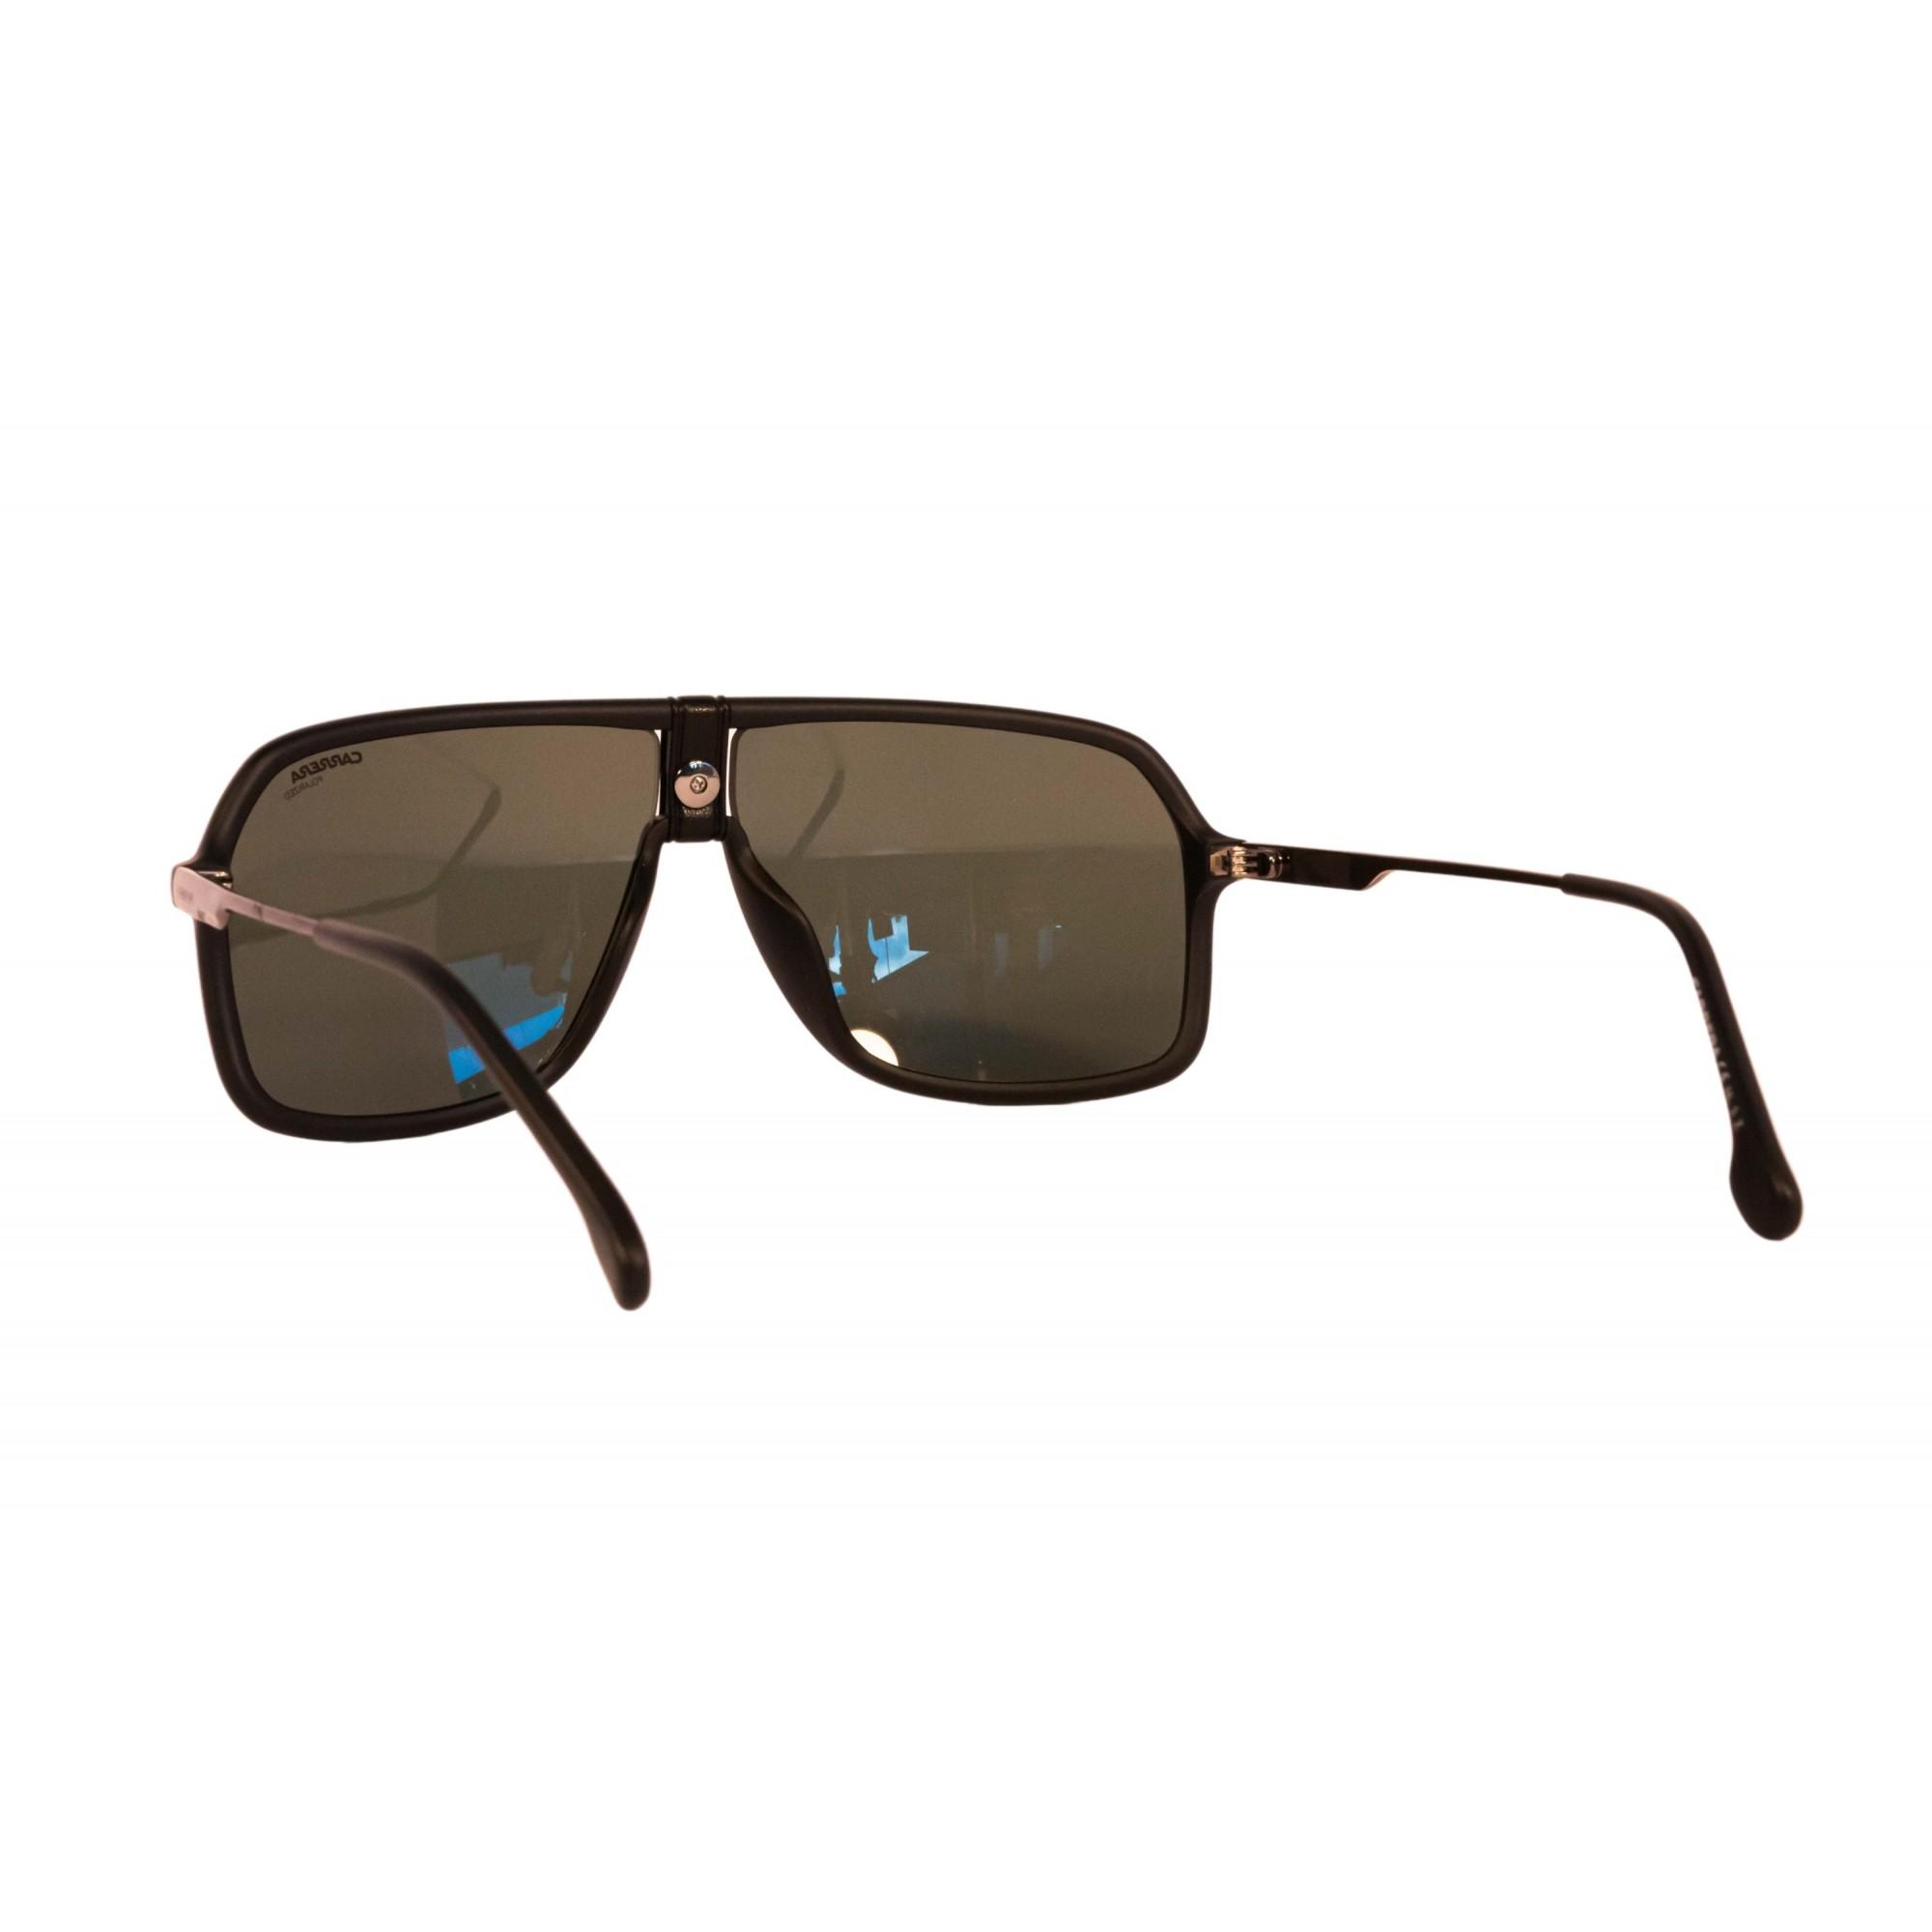 Óculos Carrera Mascara ca1019s 003uc 64 Preto